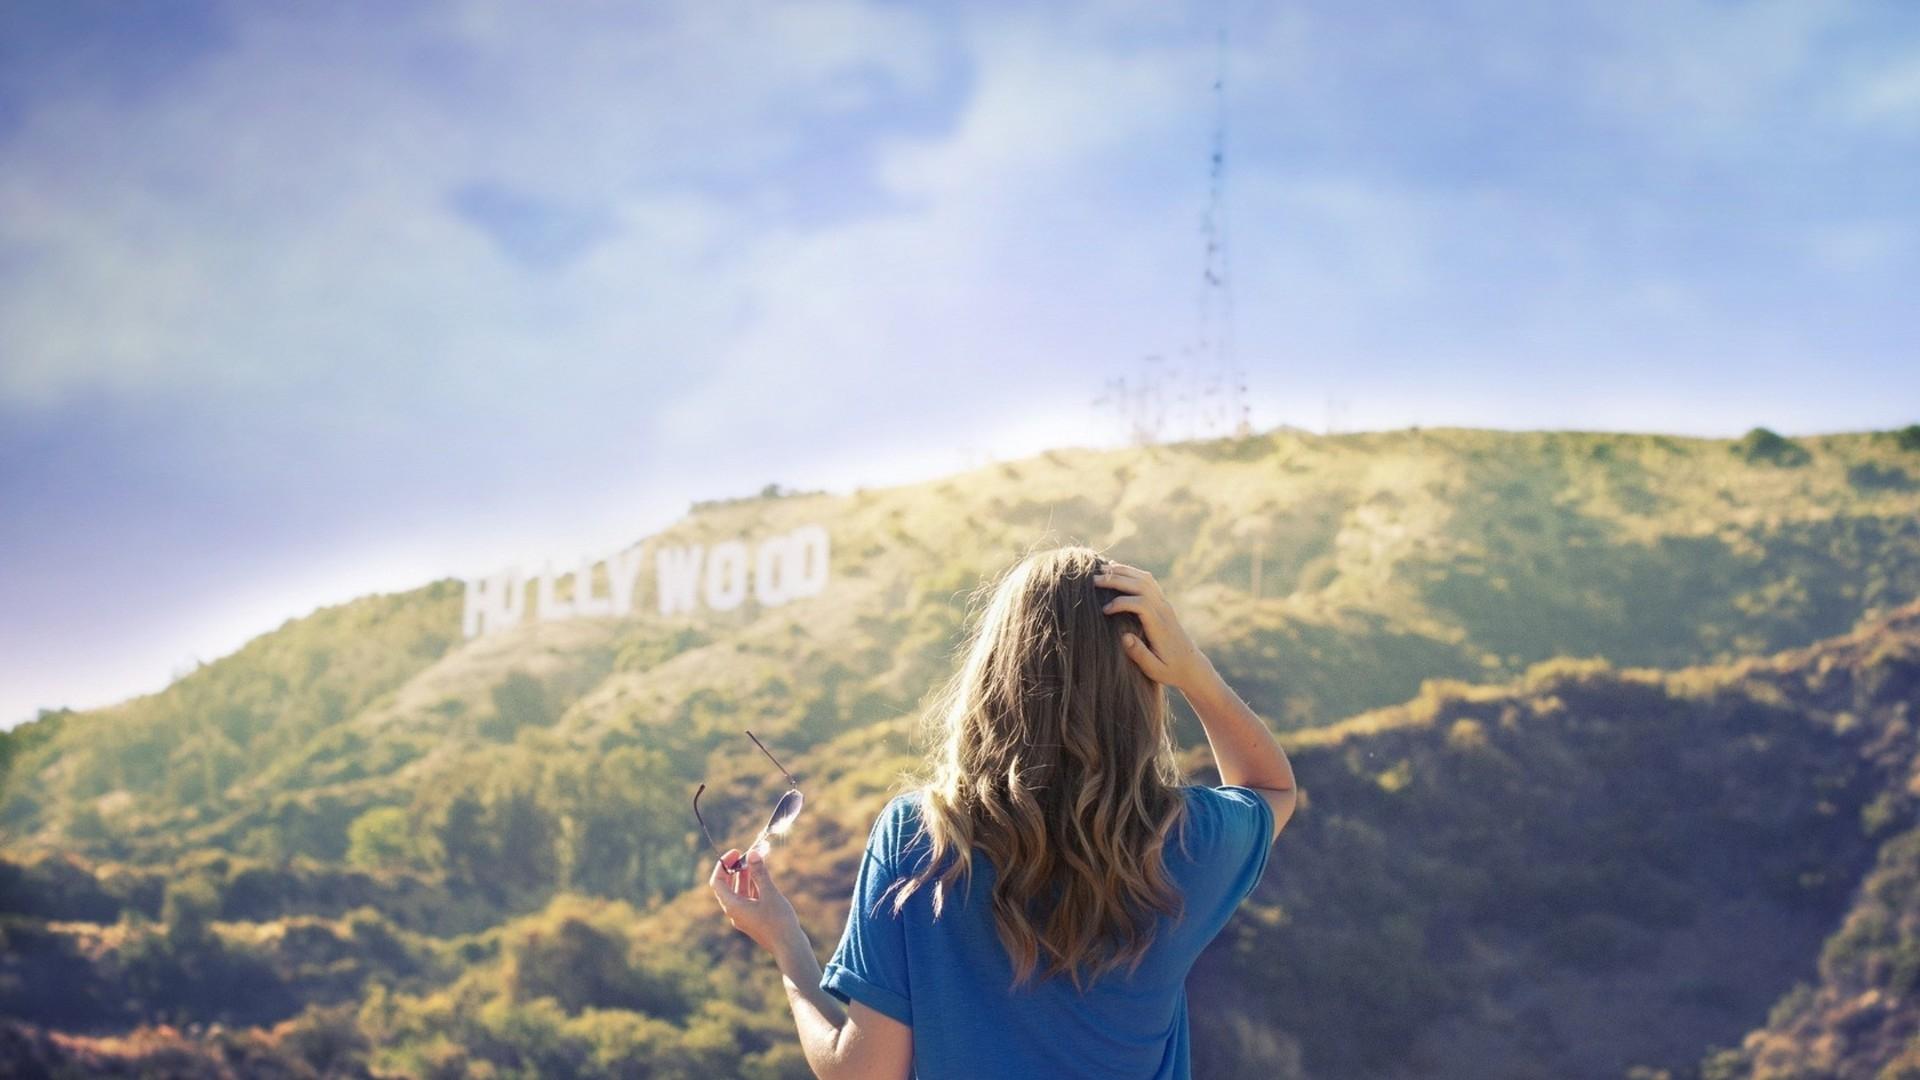 Beautiful Wallpaper Mountain Hollywood - sunlight-hill-nature-grass-sky-photography-blue-morning-hair-wind-horizon-walking-Hollywood-vacation-cloud-tree-mountain-girl-adventure-mountainous-landforms-640664  Collection_80331.jpg